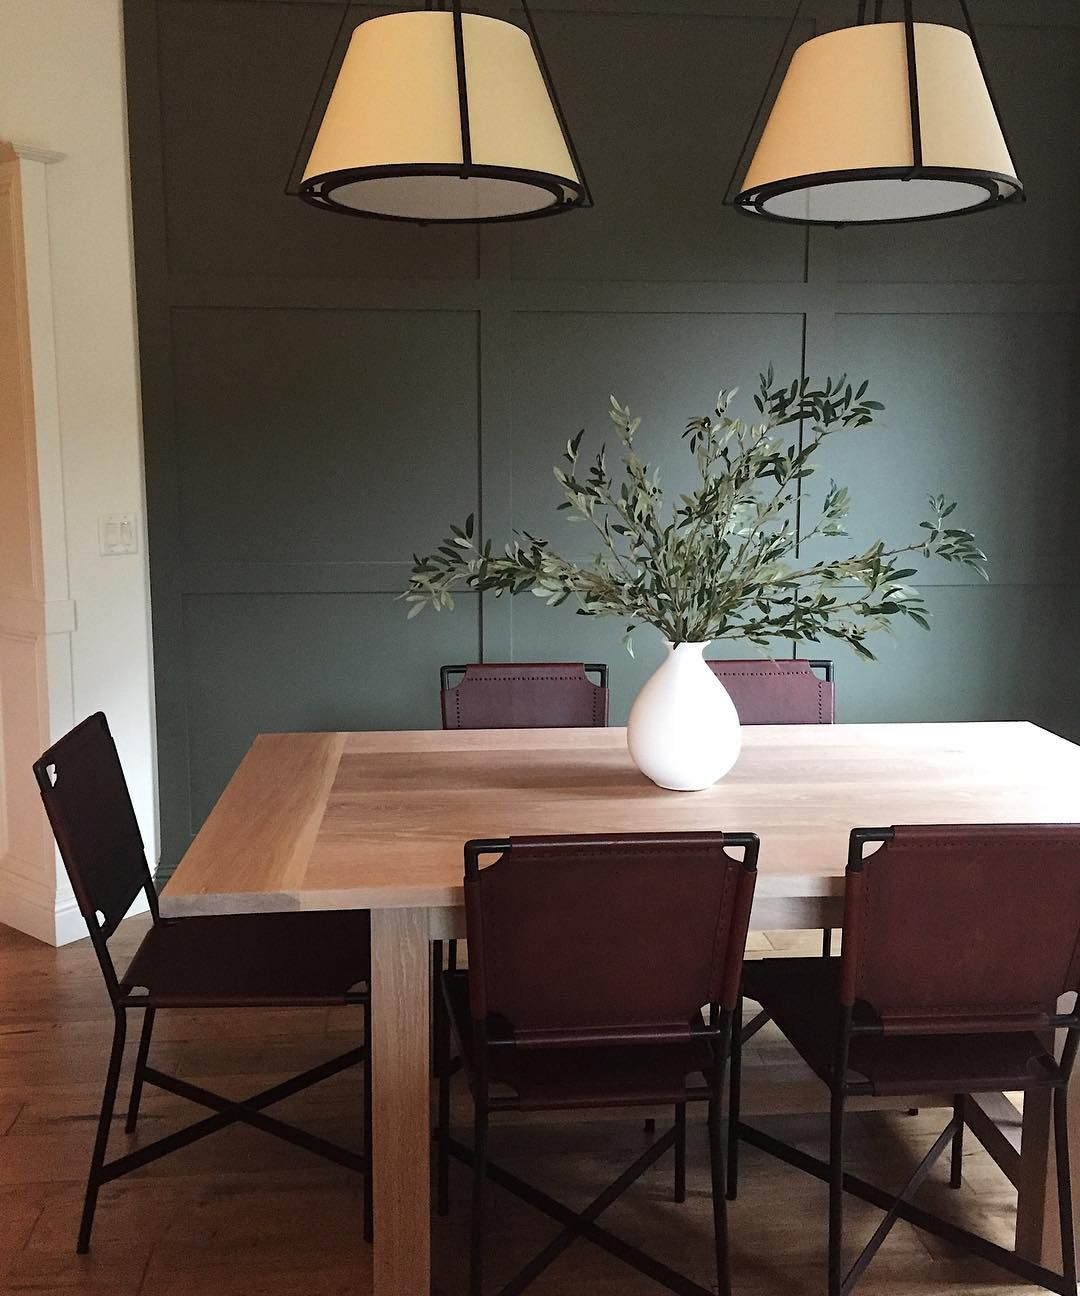 Benjamin Moore Vintage Vogue Living room paint, Bedroom